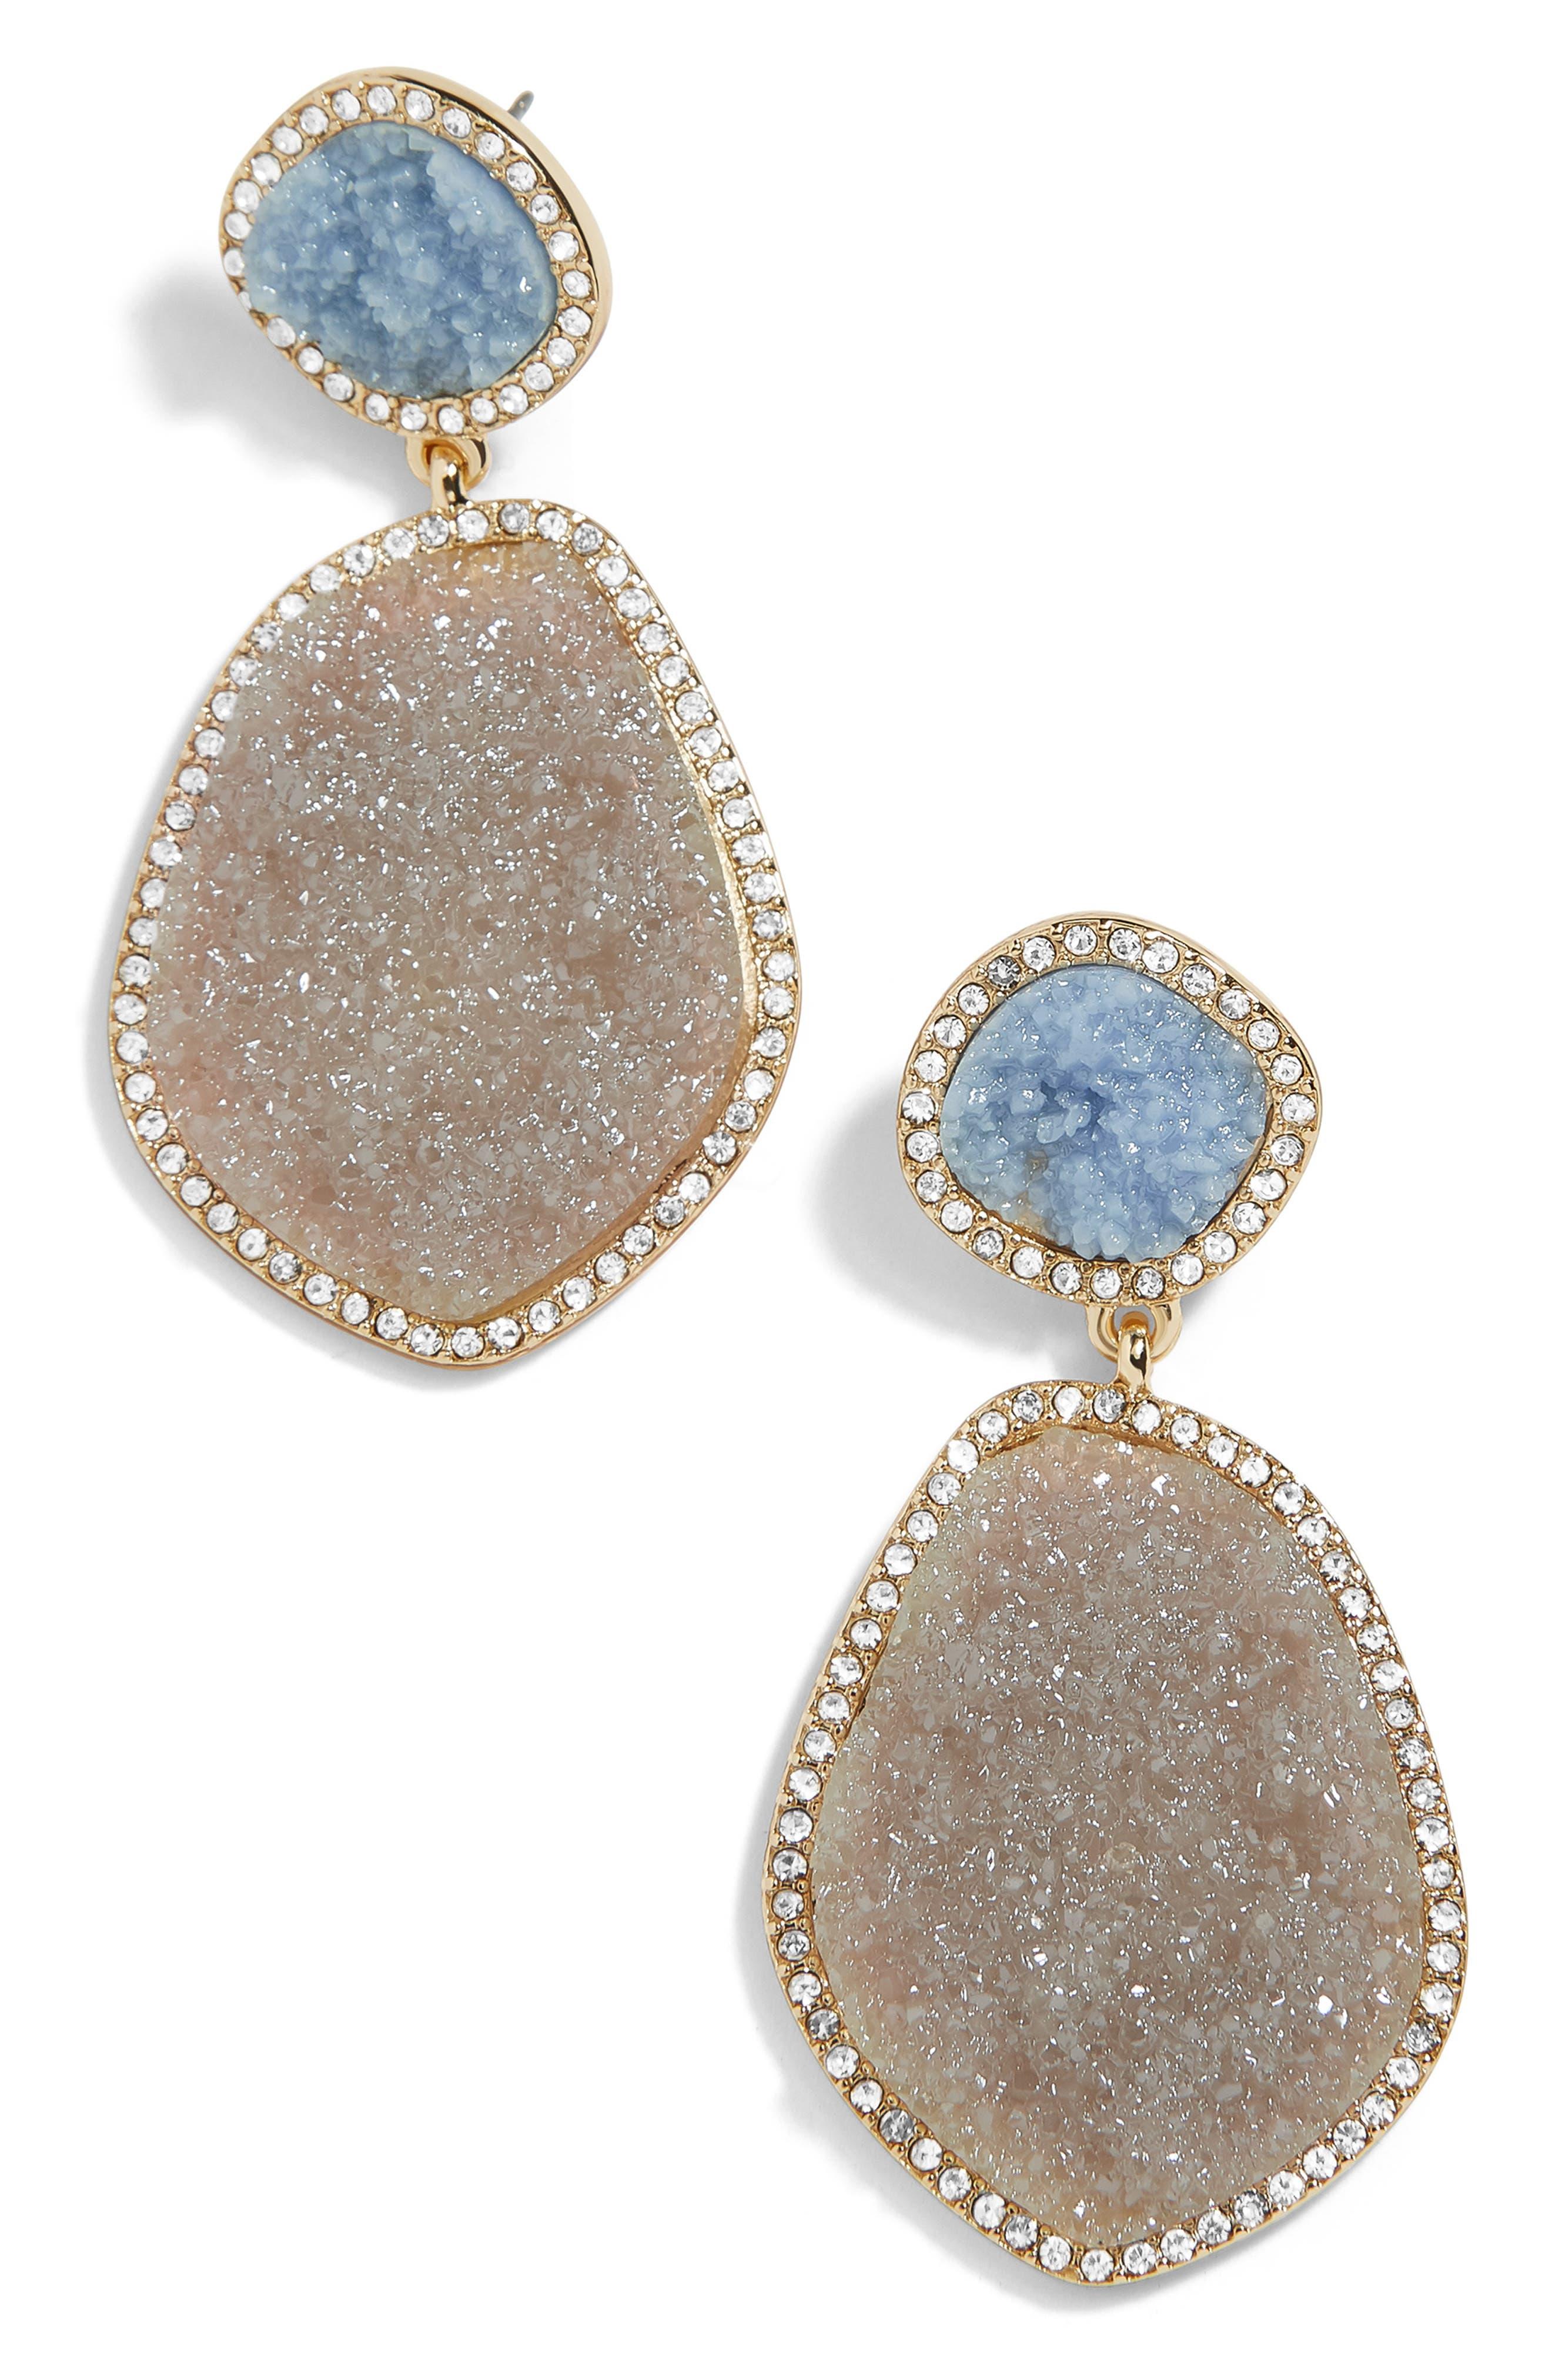 BAUBLEBAR Vina Drop Earrings, Main, color, GREY